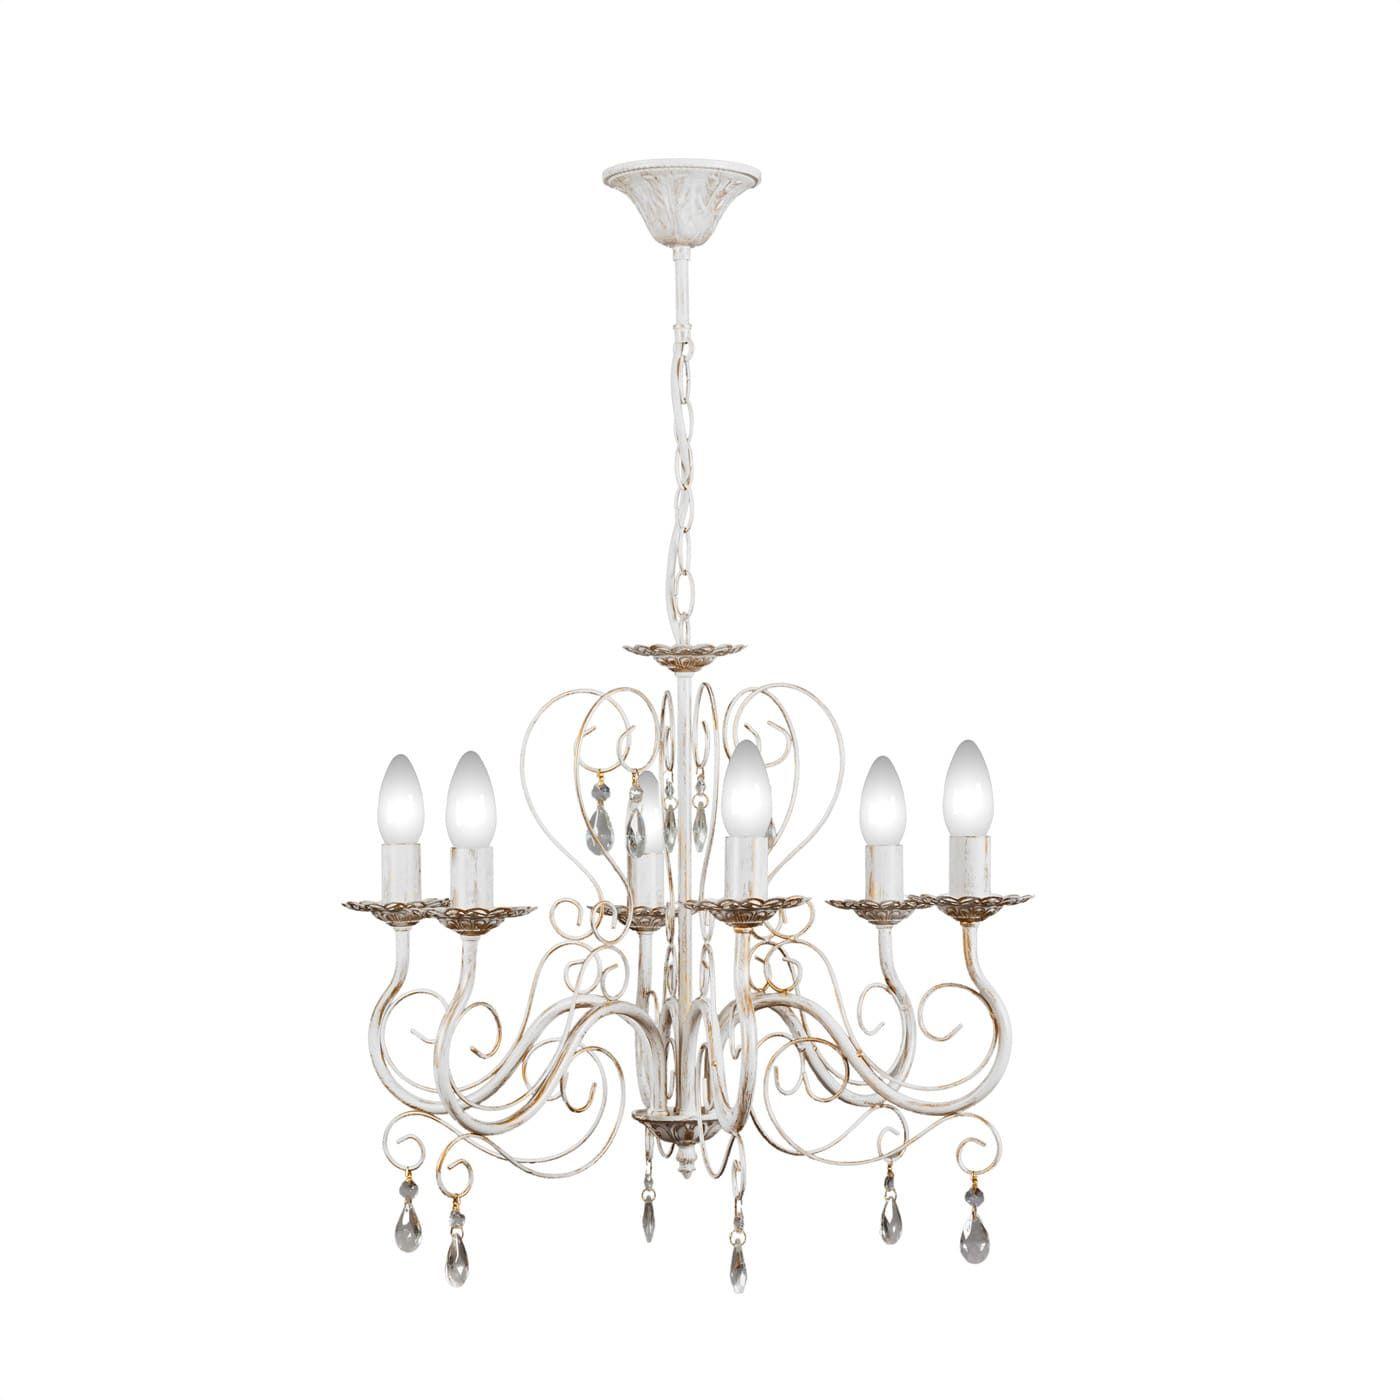 PETRASVET / Pendant chandelier S1021-6, 6xE14 max. 60W